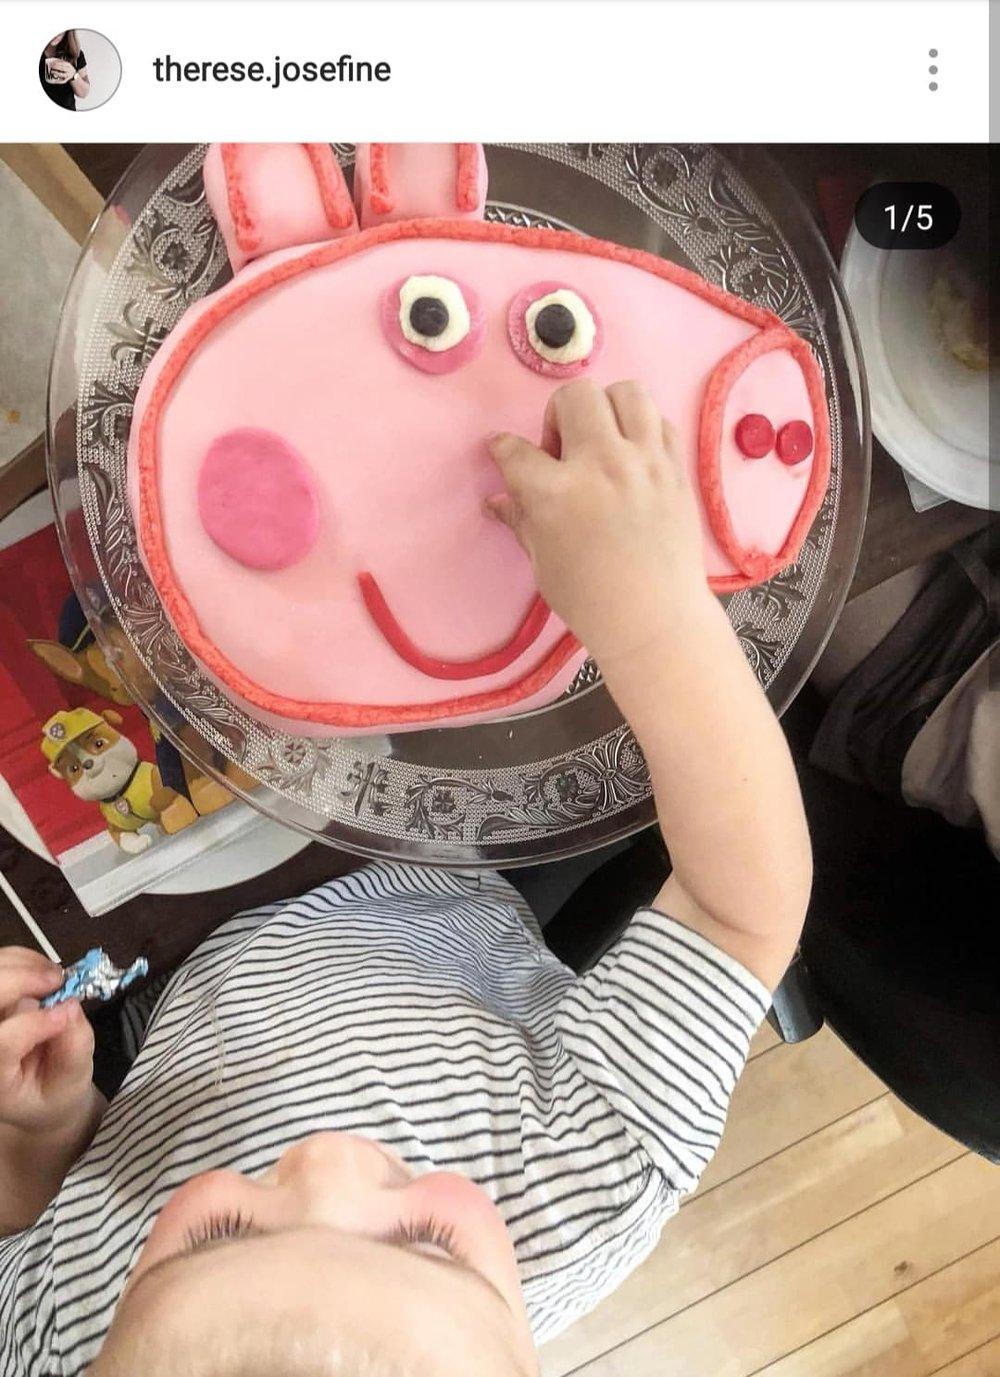 Denne fine gurli gris kage er vi vilde med! Og hvilken Gurli fan vil ikke elske den?